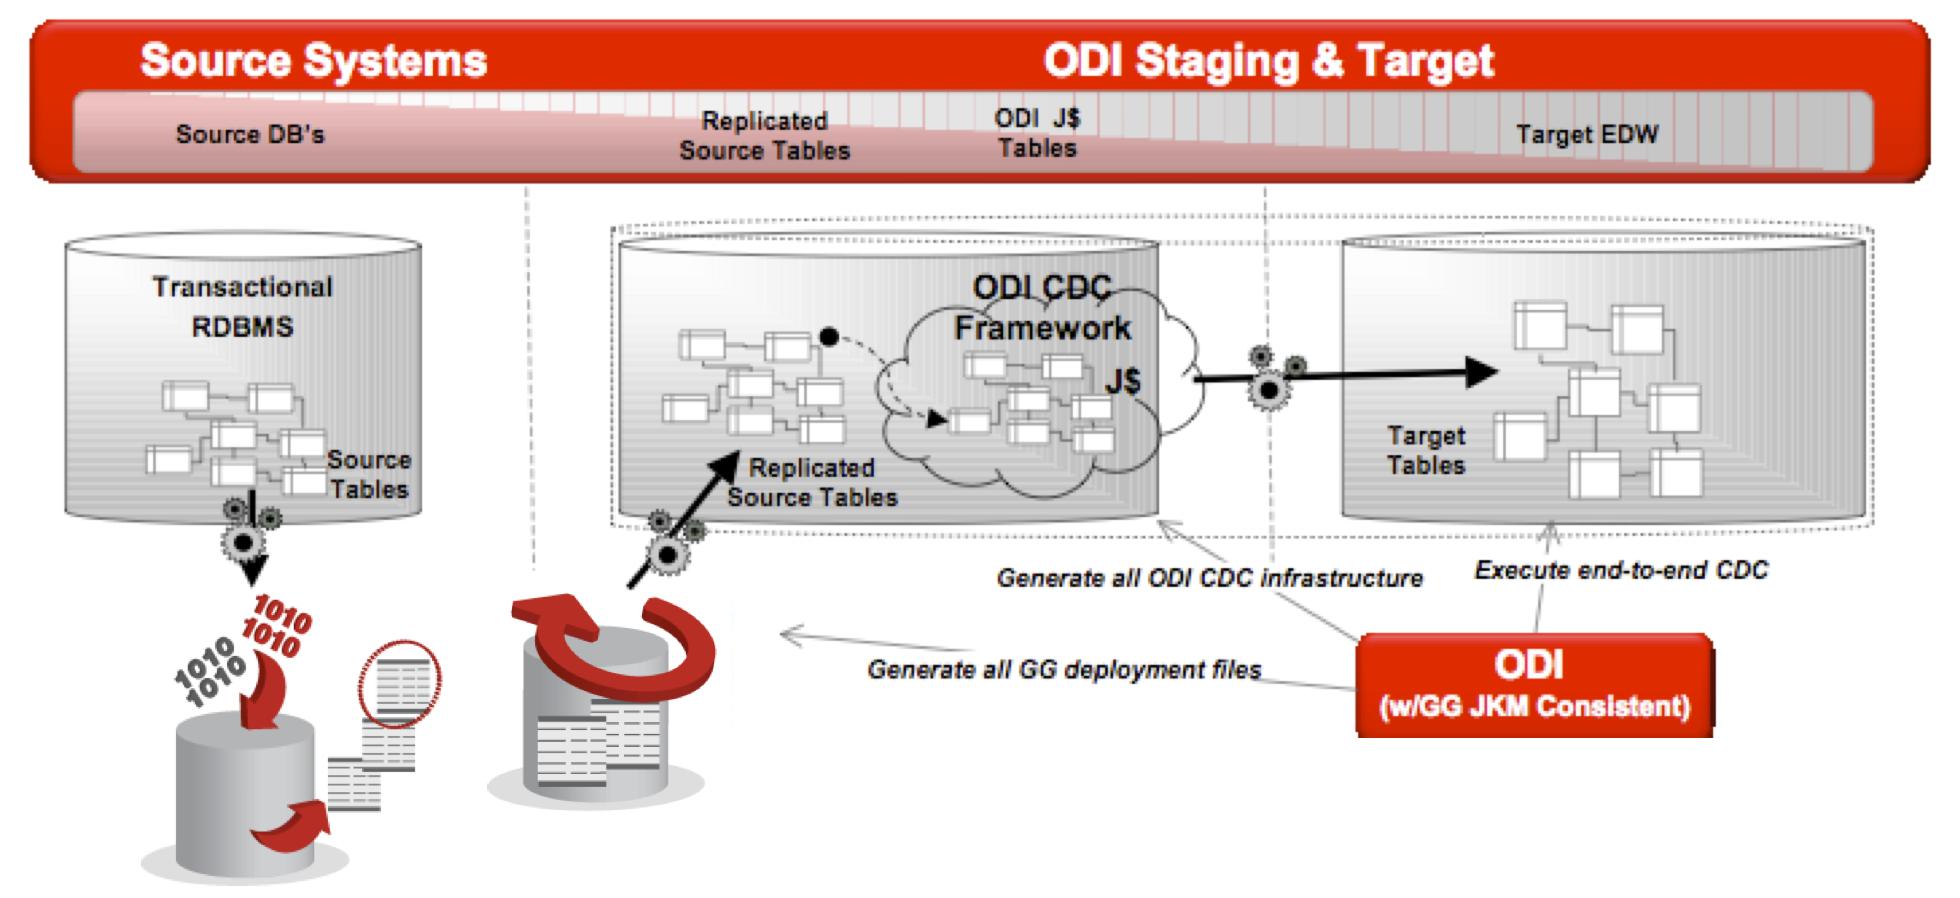 odi oracle data integrator Oracle data integrator (odi), oracle's etl tool, is a comprehensive data  integration platform, capable of high performance, high volume data.